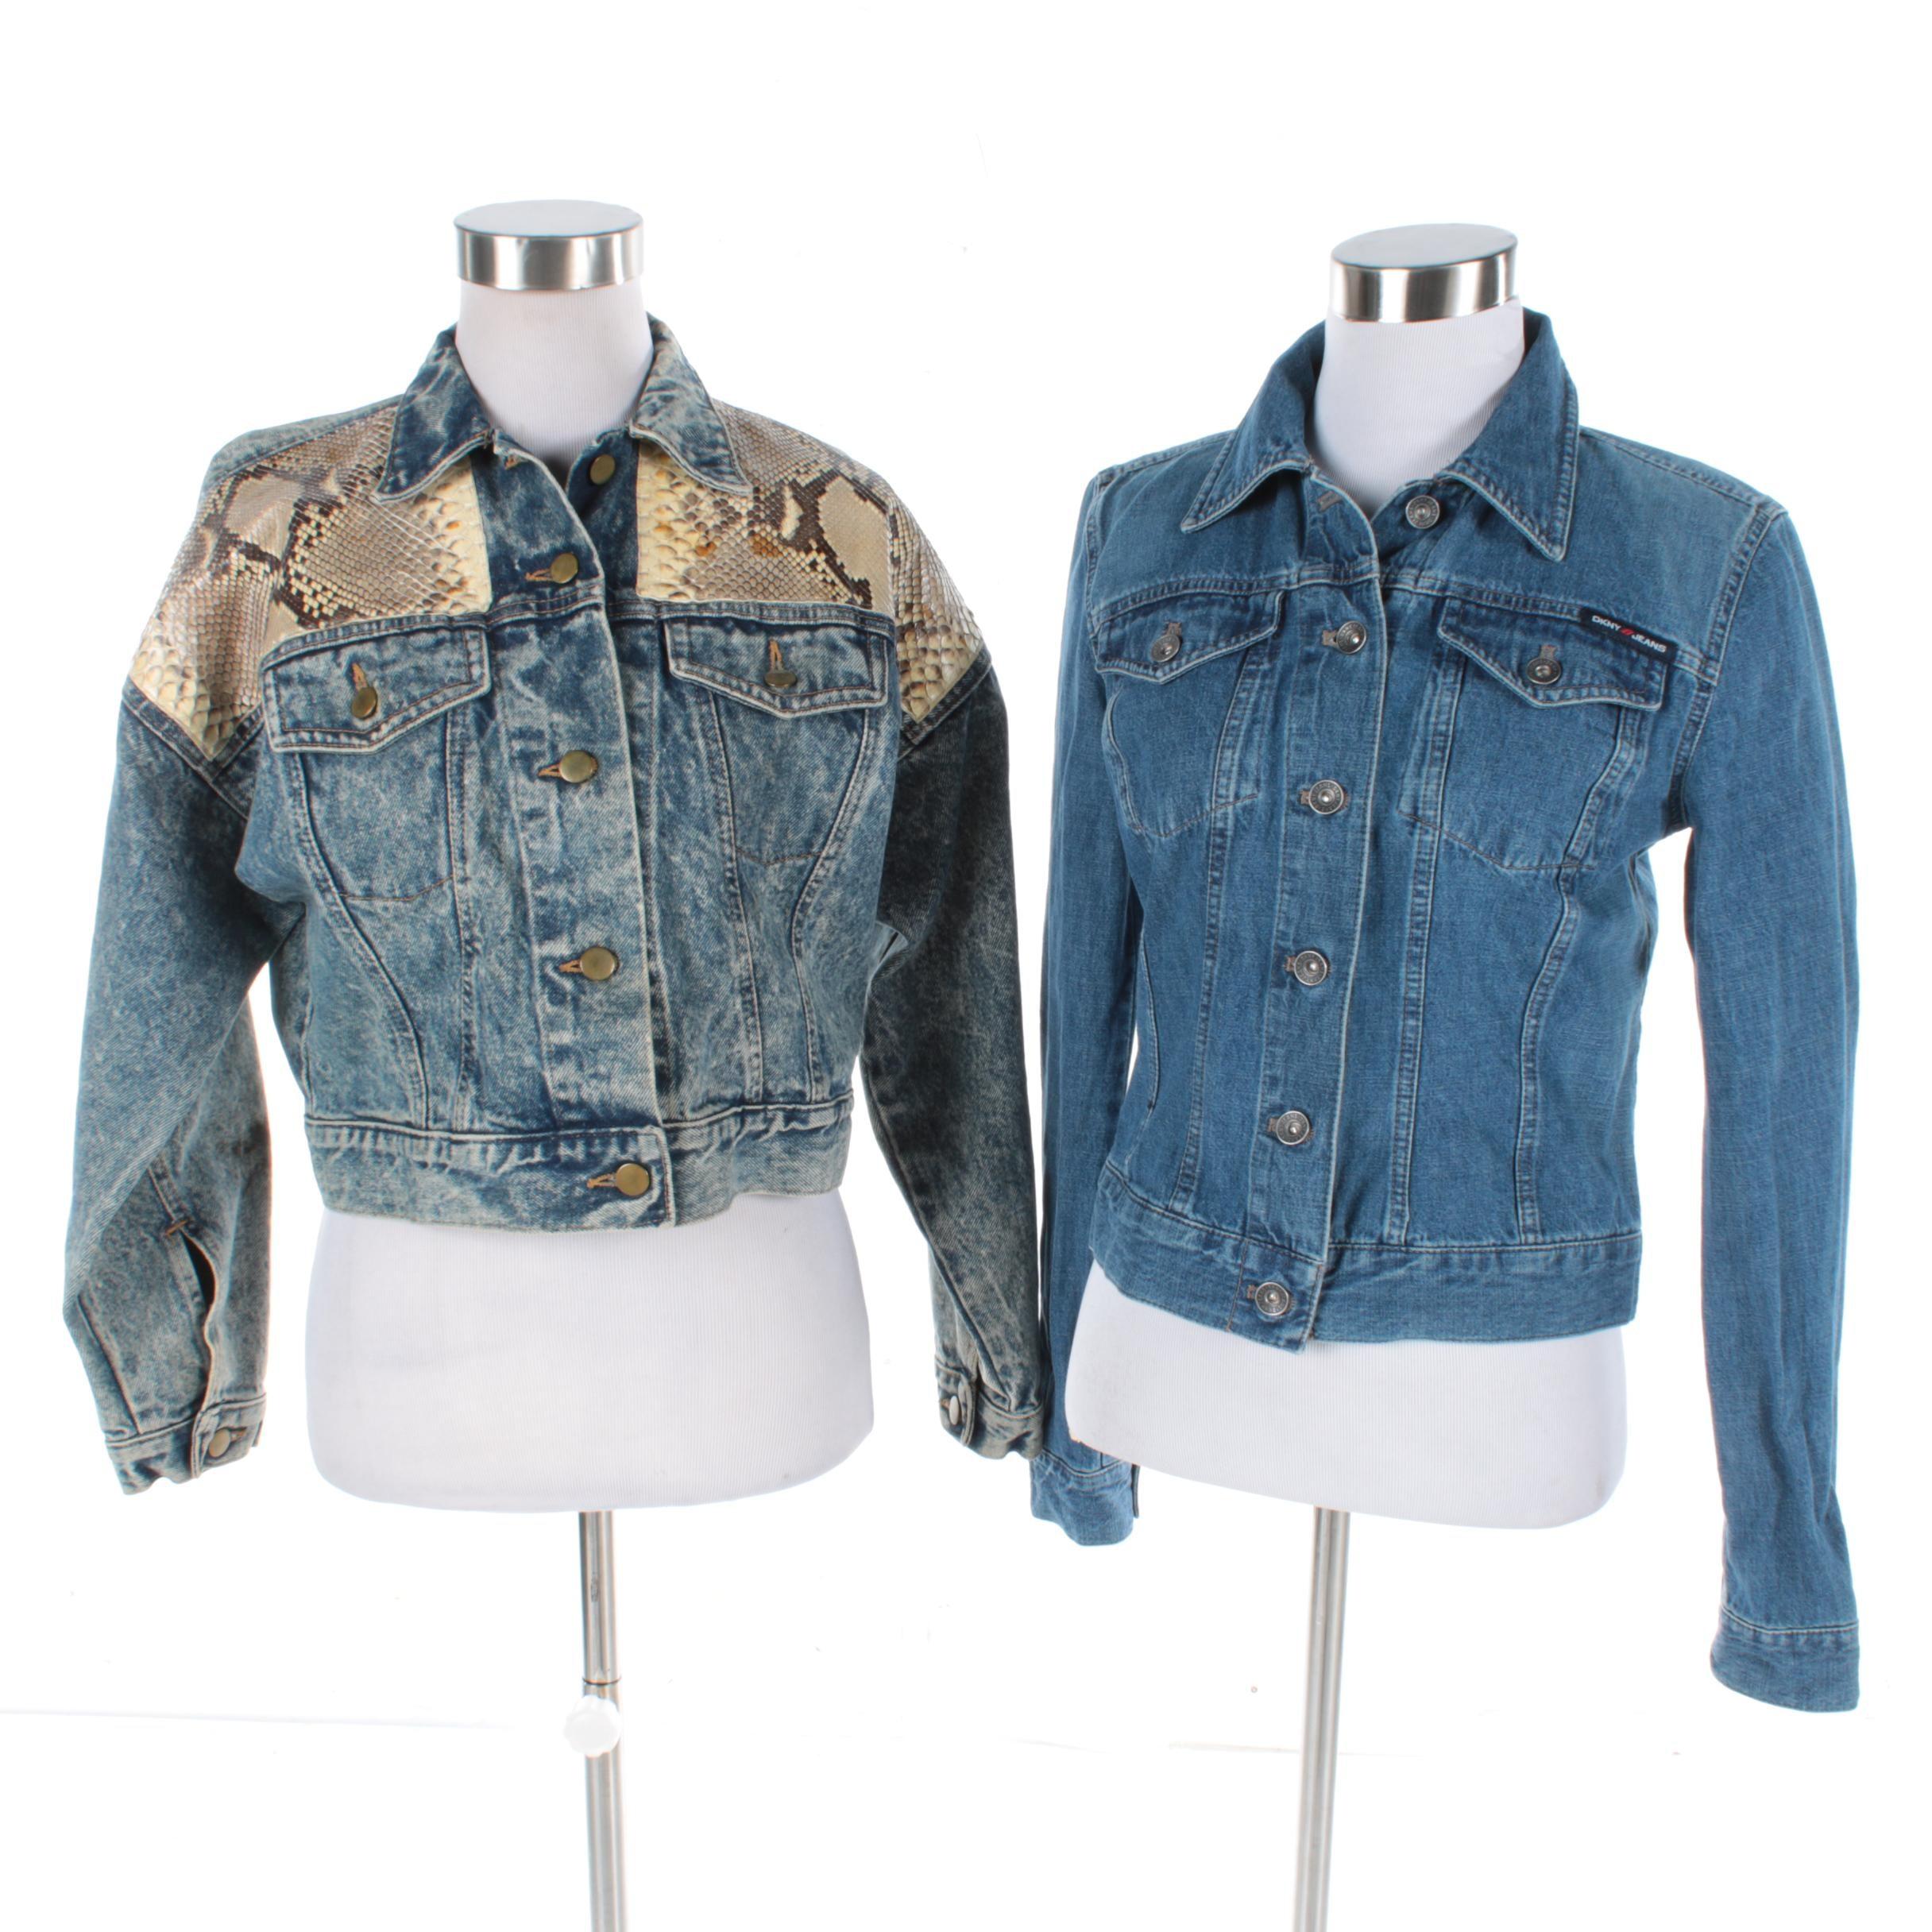 Women's Jensen Smith Python Skin Denim Jacket and DKNY Jeans Denim Jacket